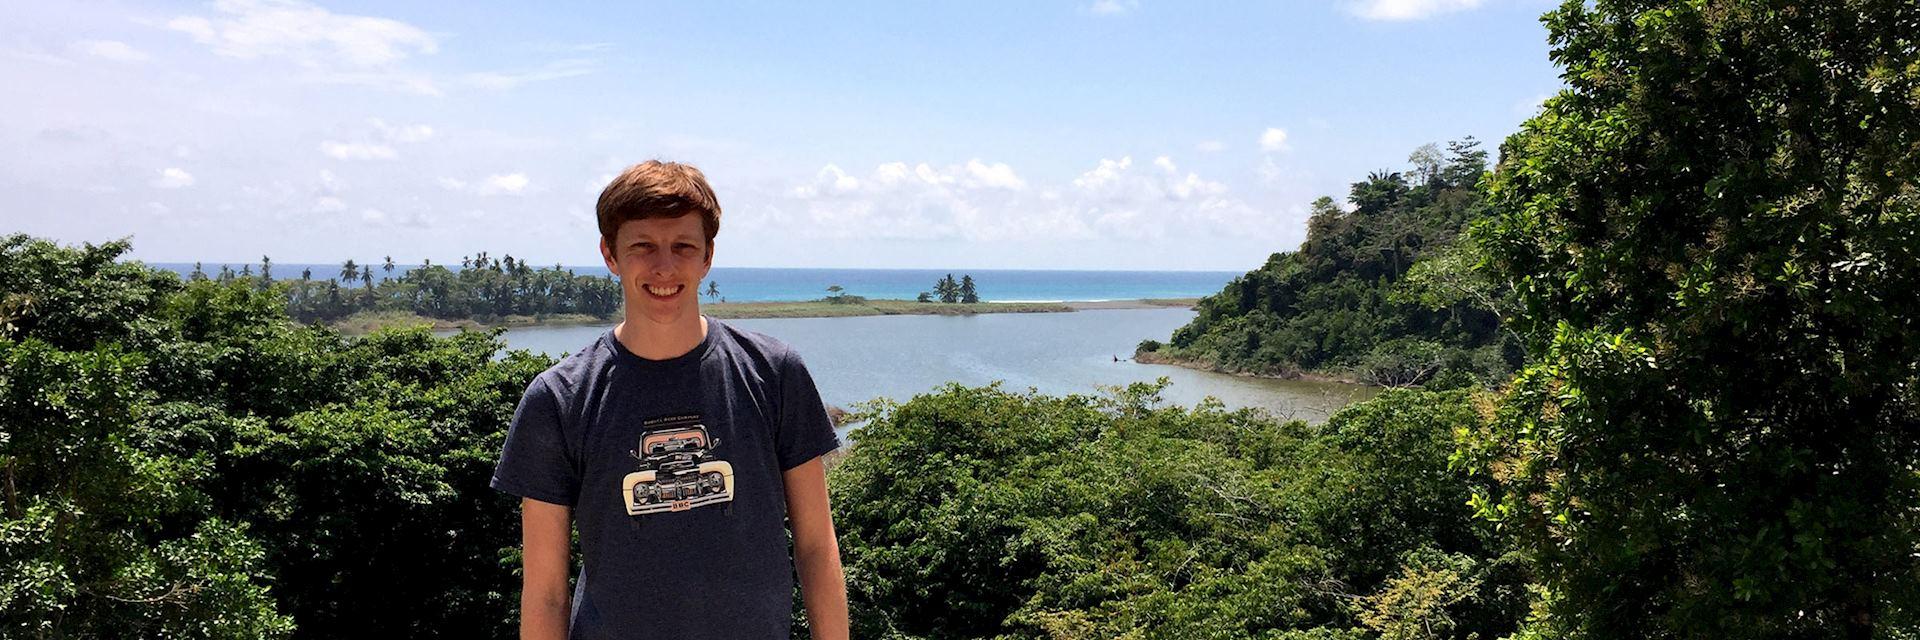 Joe on the Osa Peninsula, Costa Rica